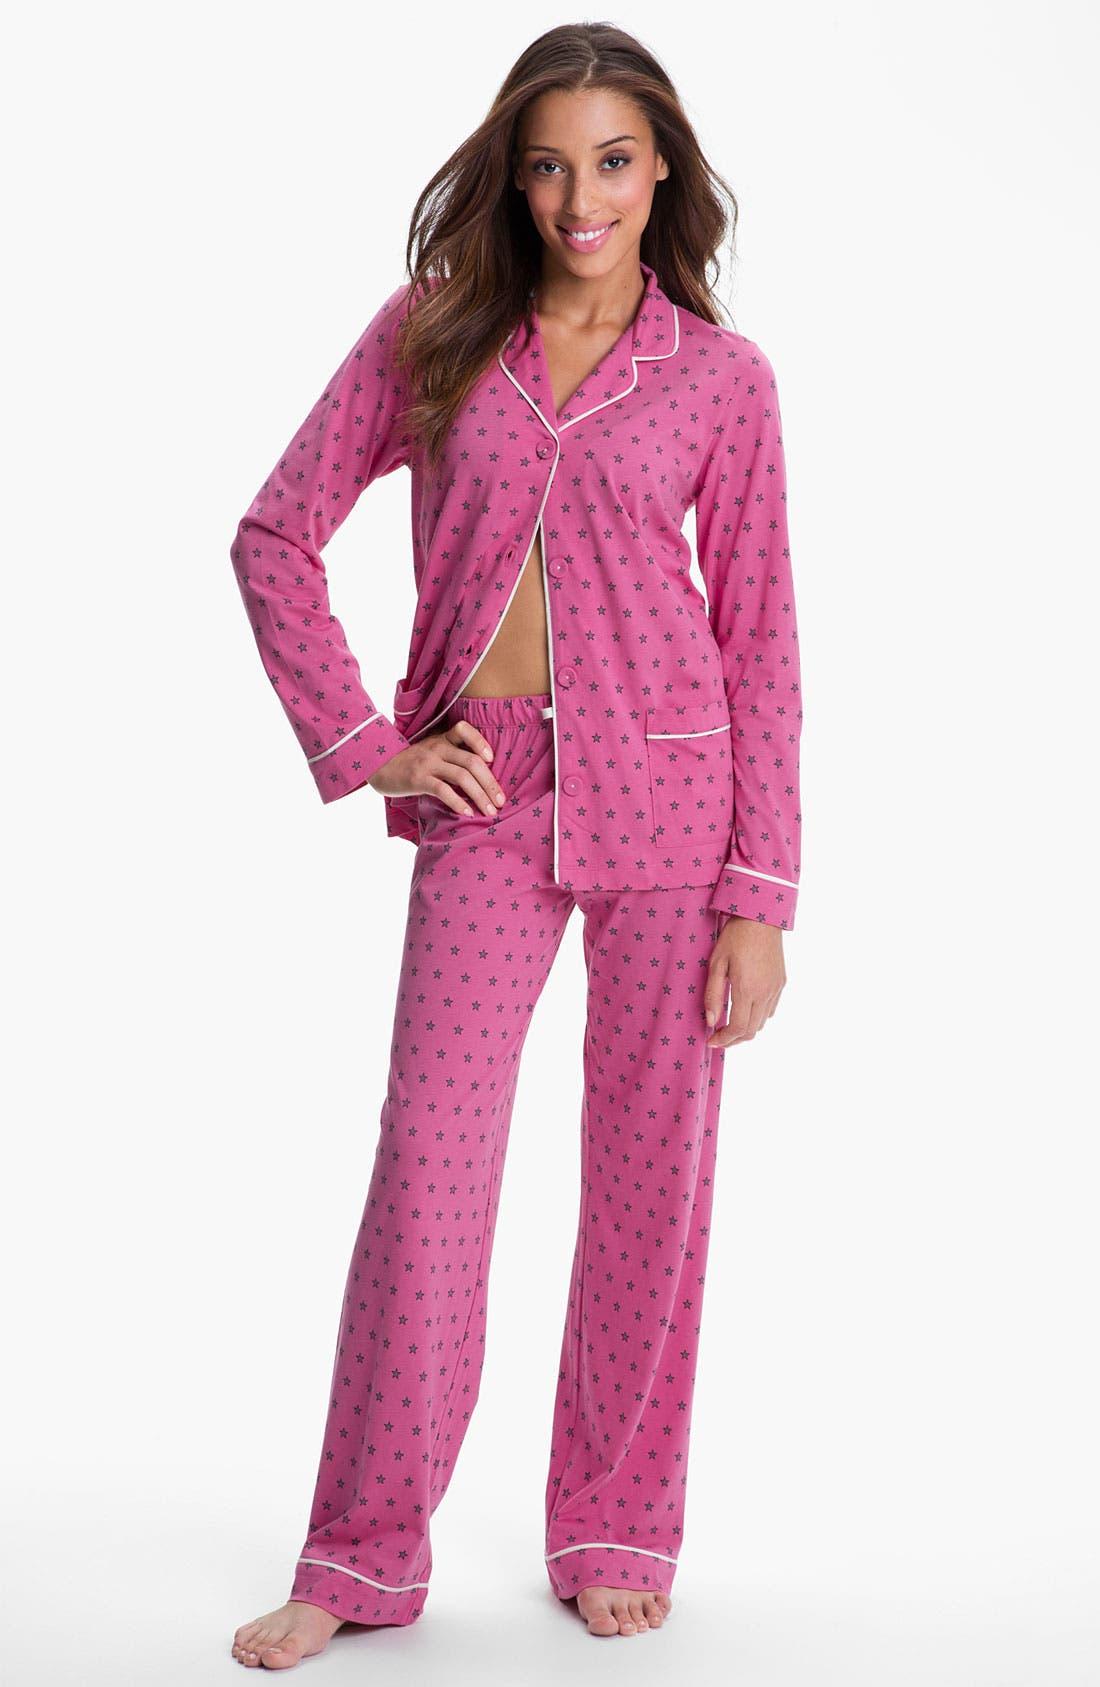 Alternate Image 1 Selected - DKNY Patterned Knit Pajamas